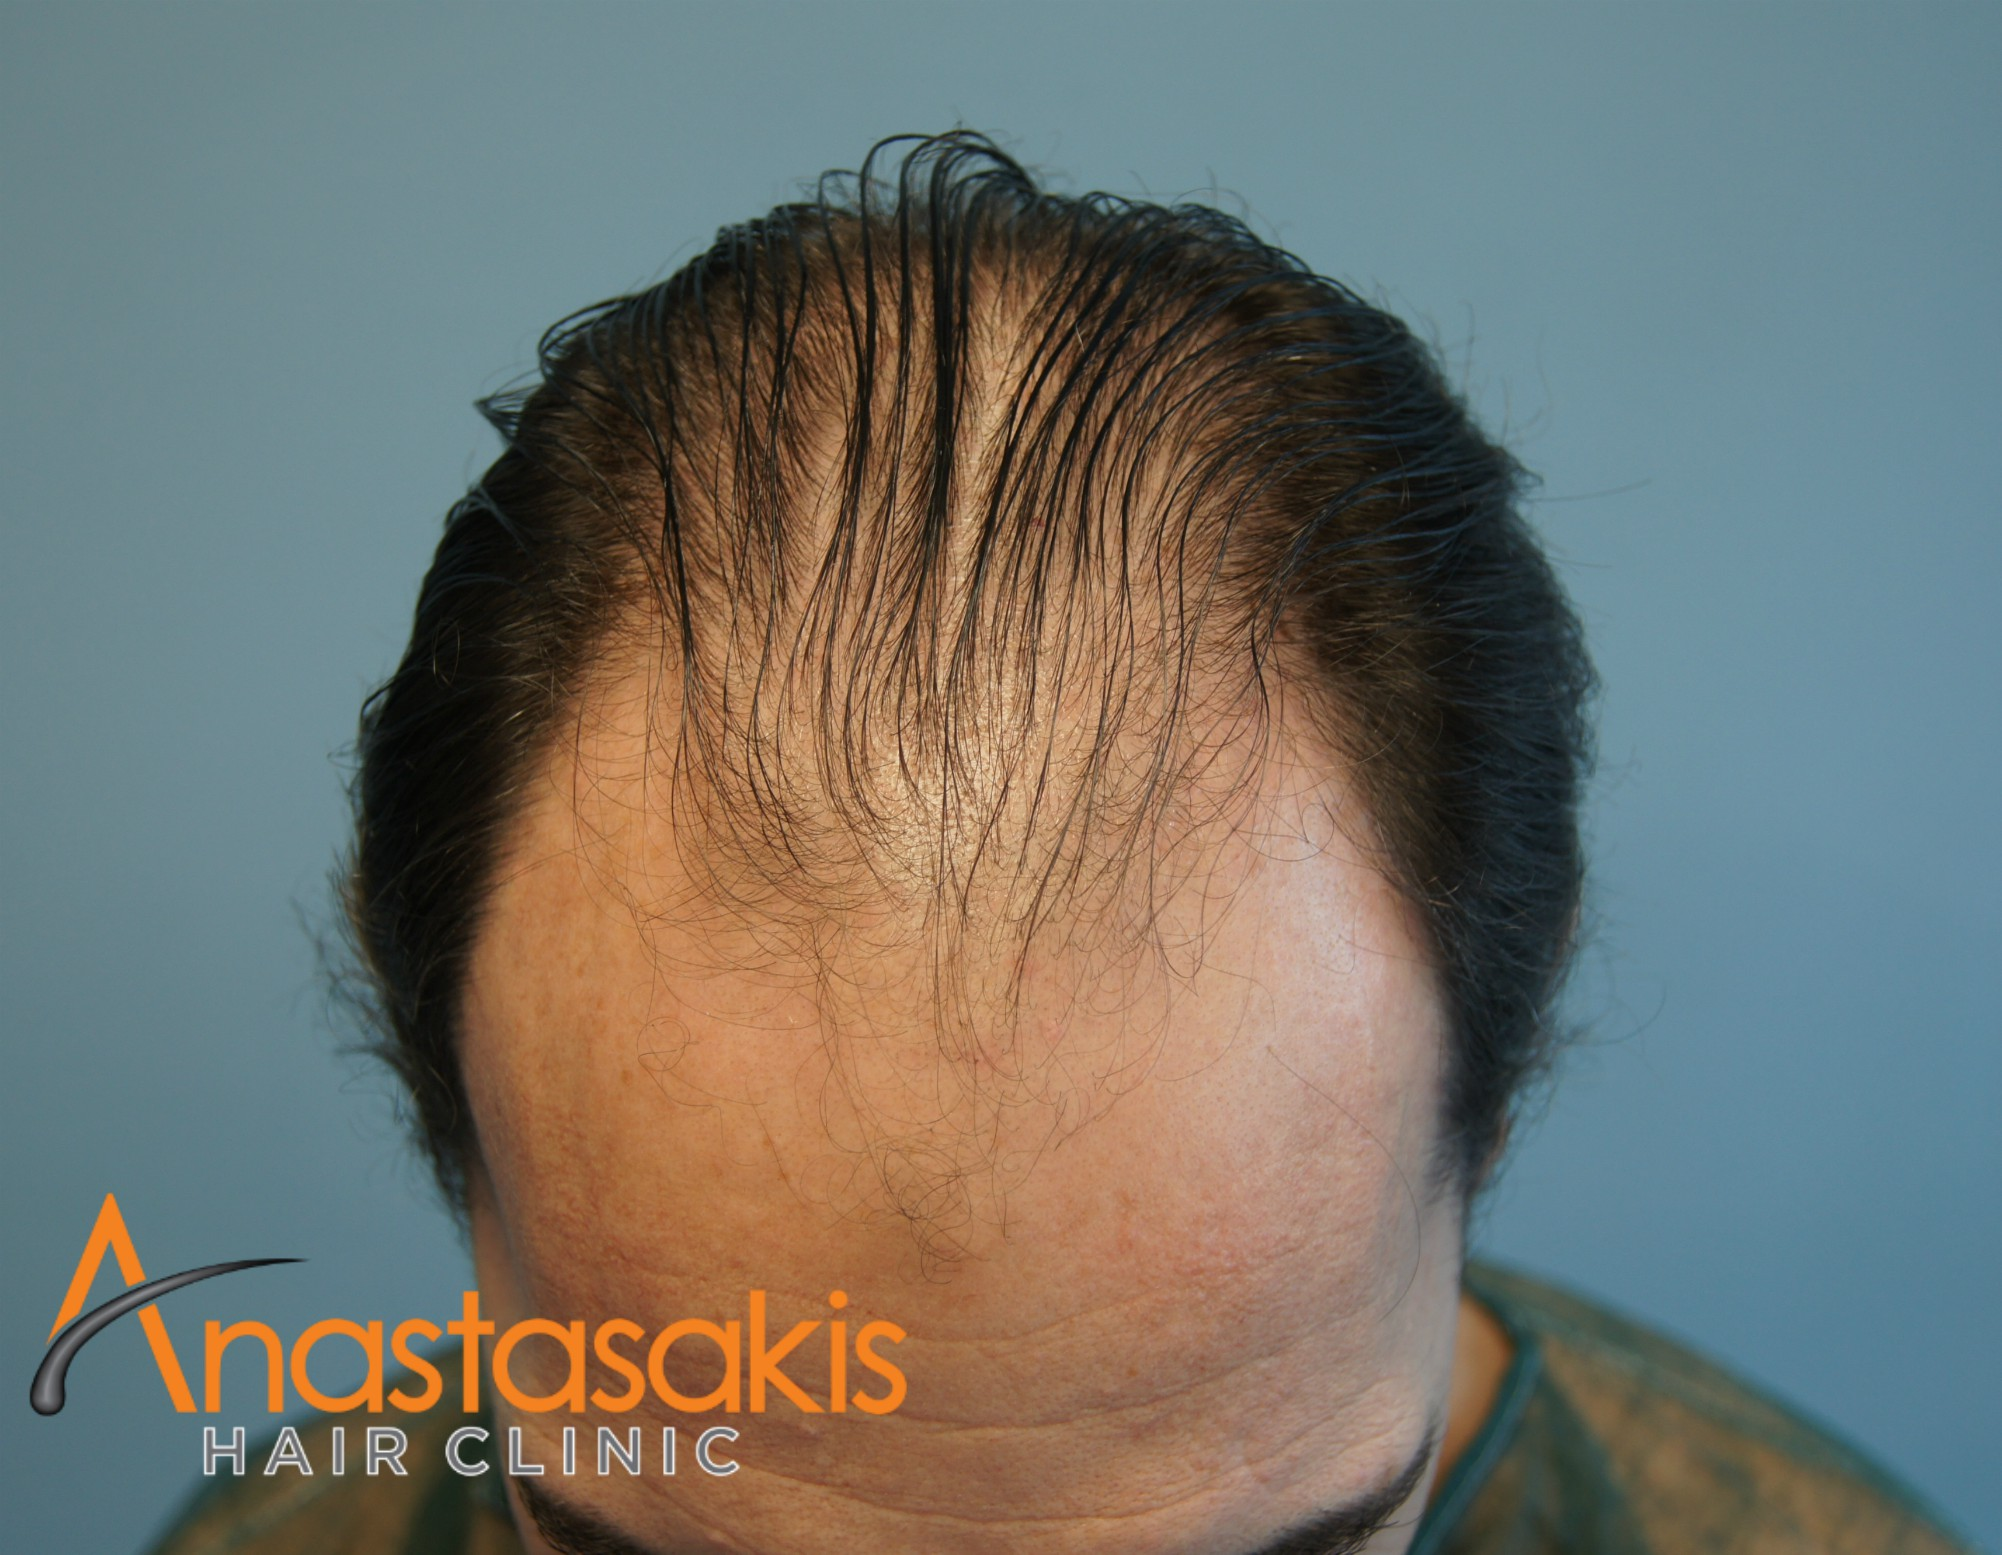 2530-FUS-result-anastasakis-hair-clinic-mar-fut